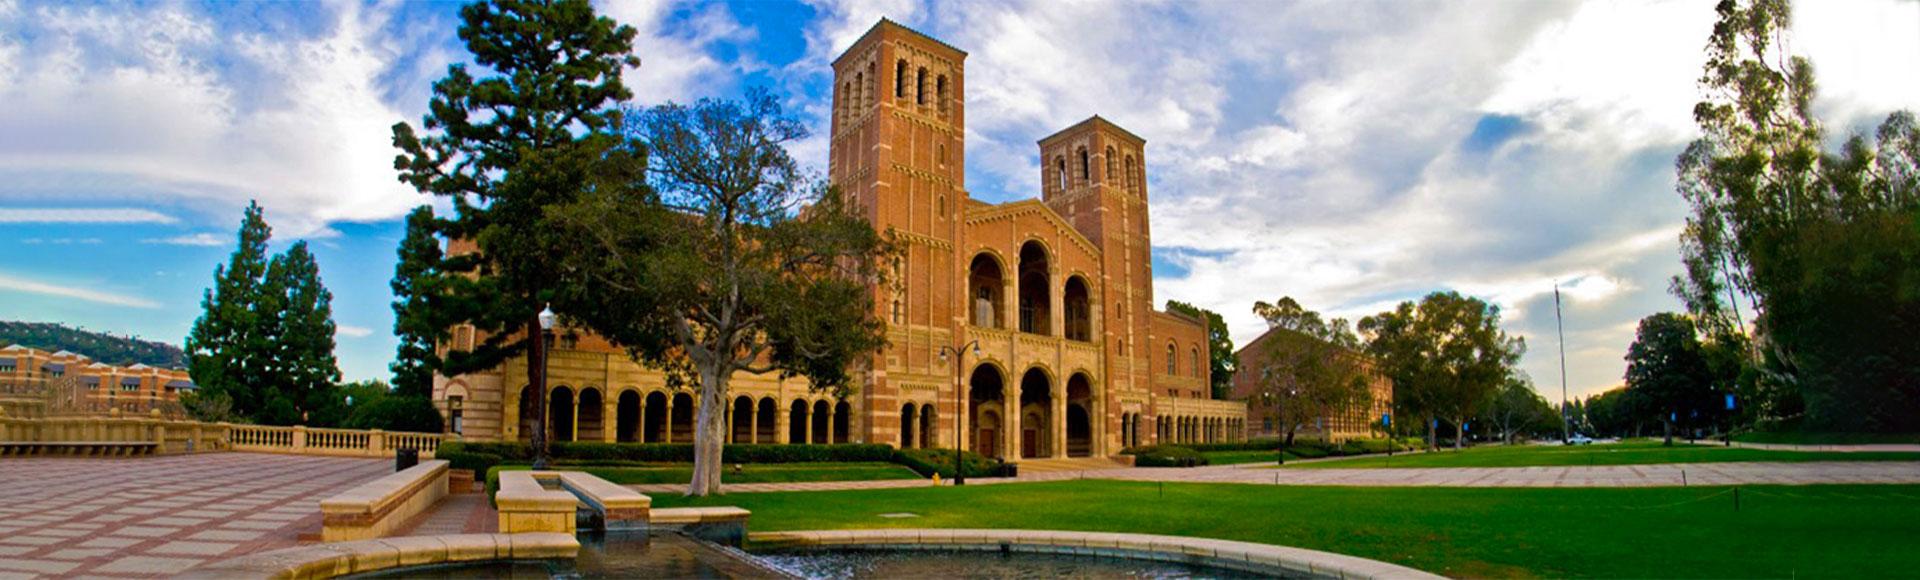 ucla_university-california-los-angeles.jpg